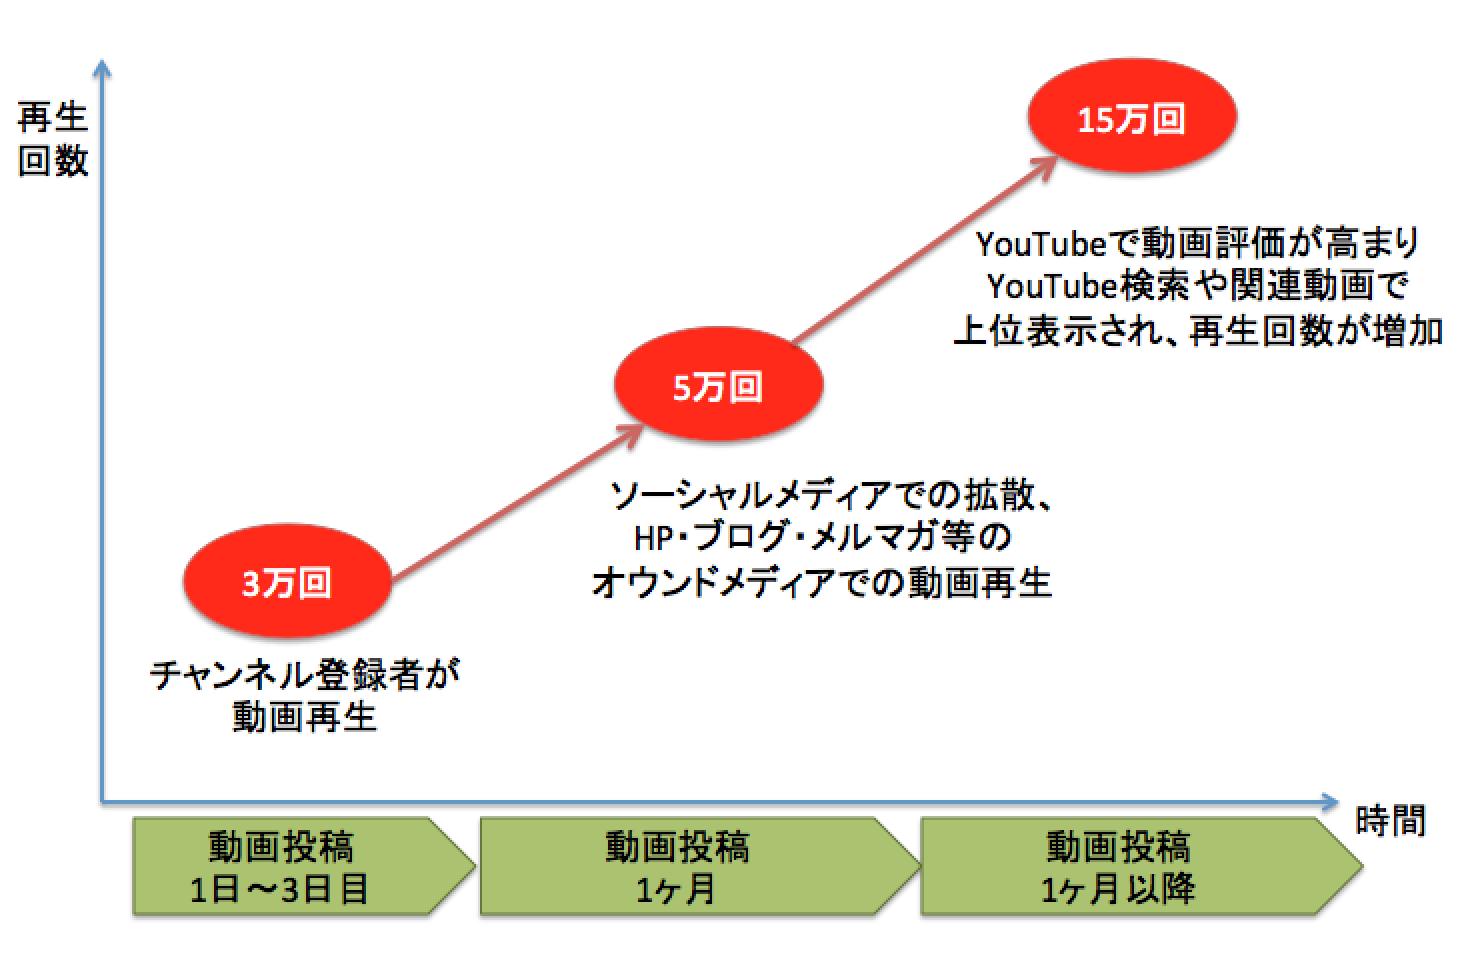 YouTubeチャンネル登録者5万人のユーチューバーの動画再生回数の推移